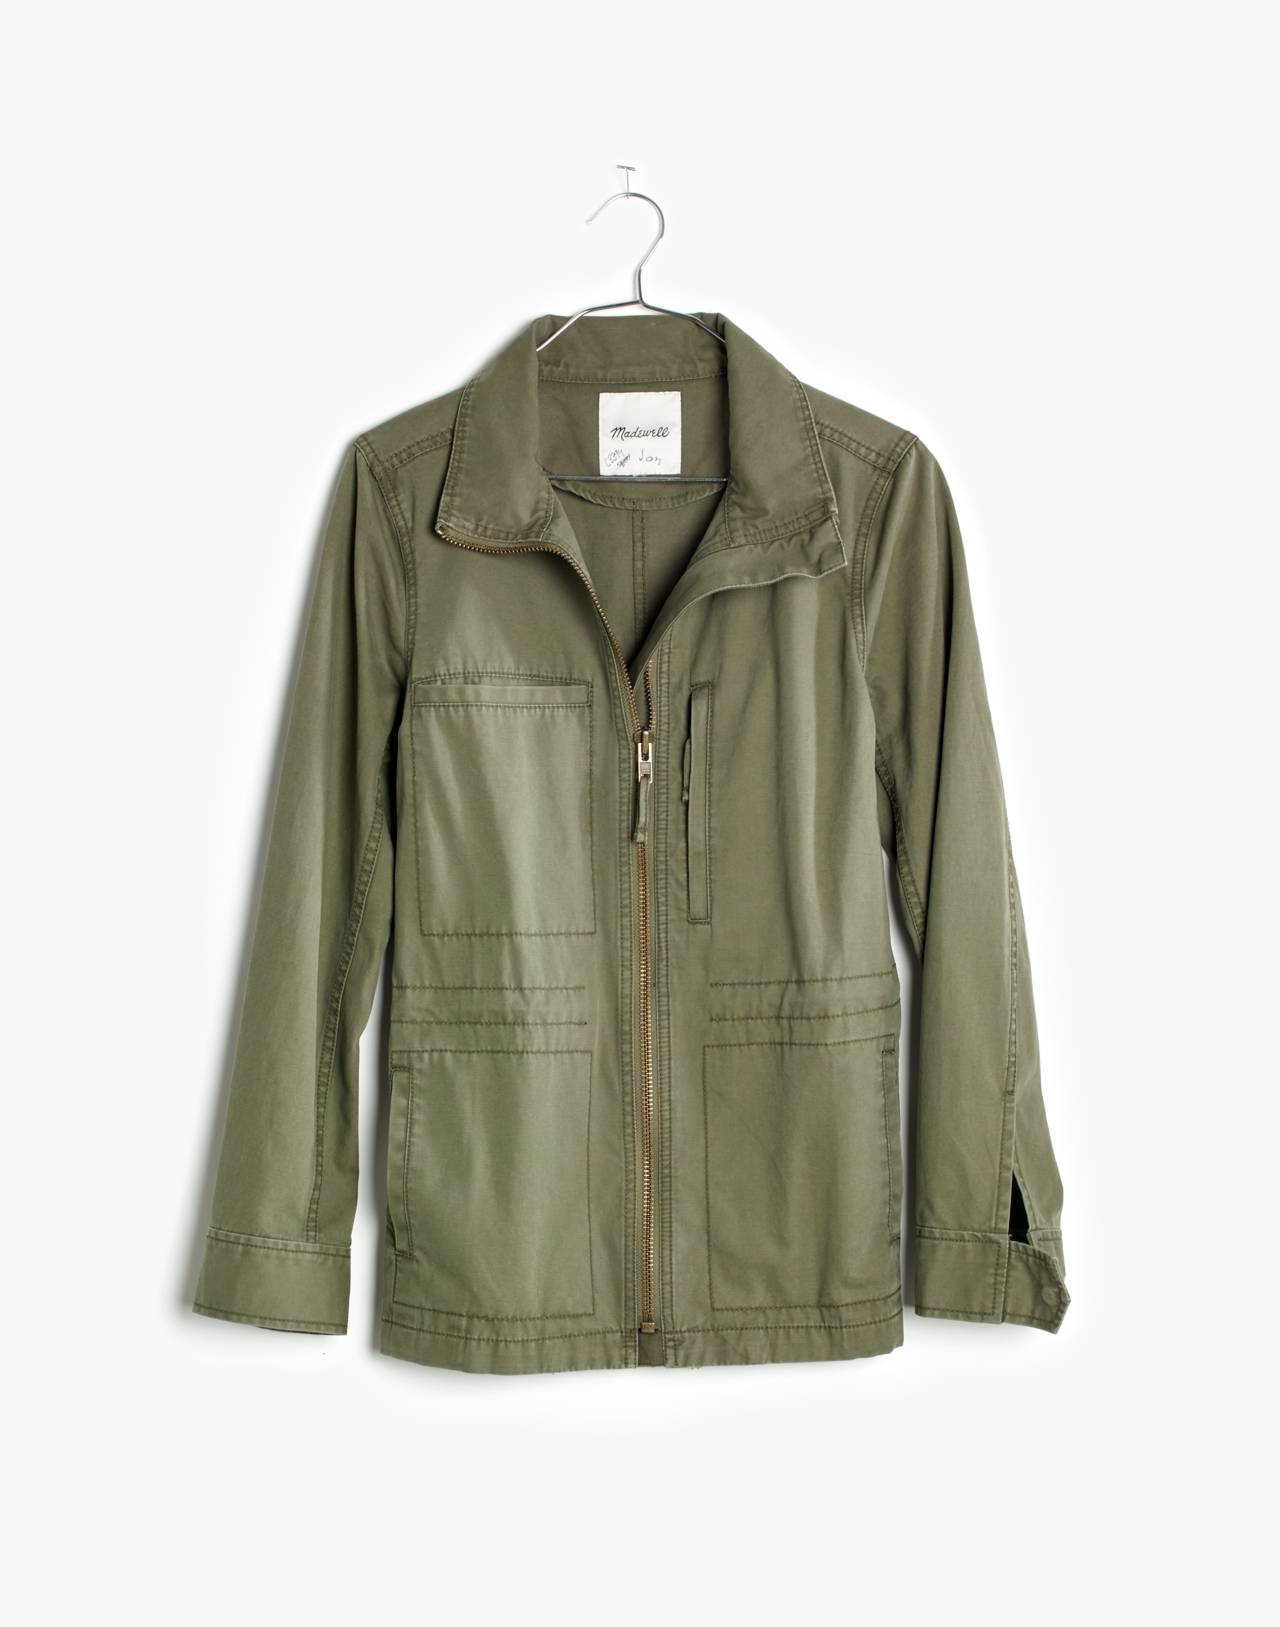 Fleet Jacket in desert olive image 4